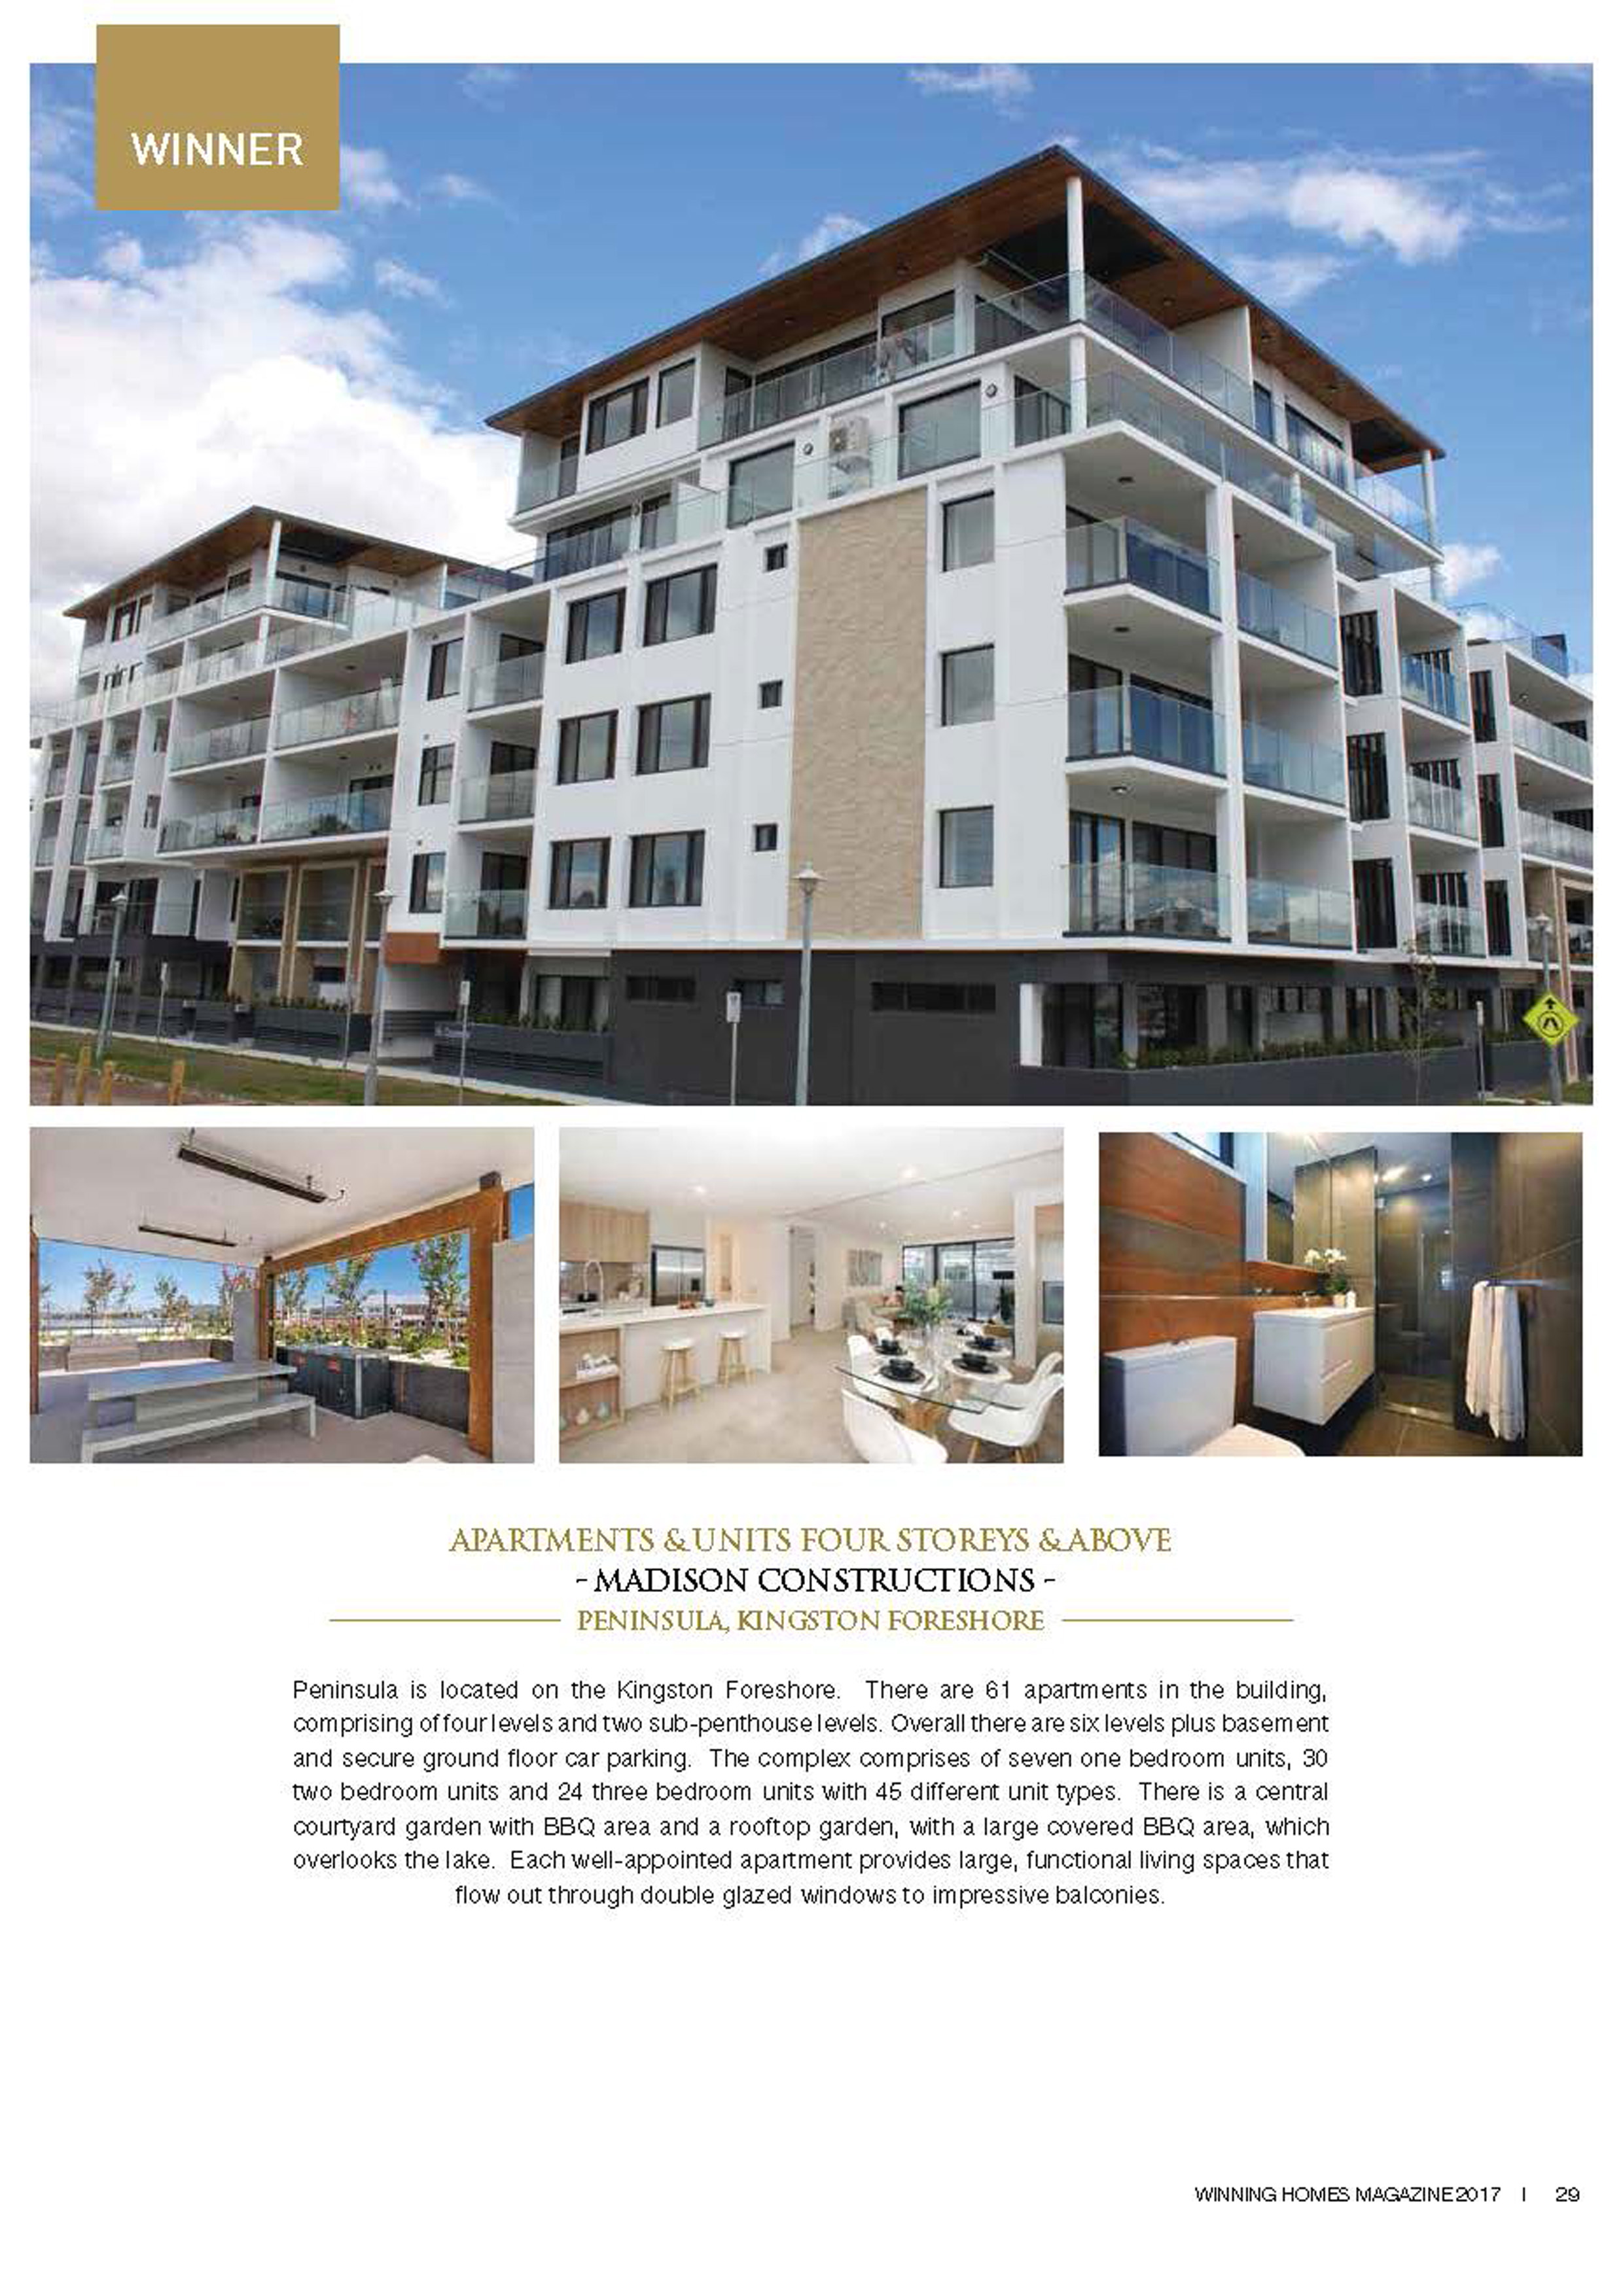 1-winninng-homes-2017-e-magazine.jpg